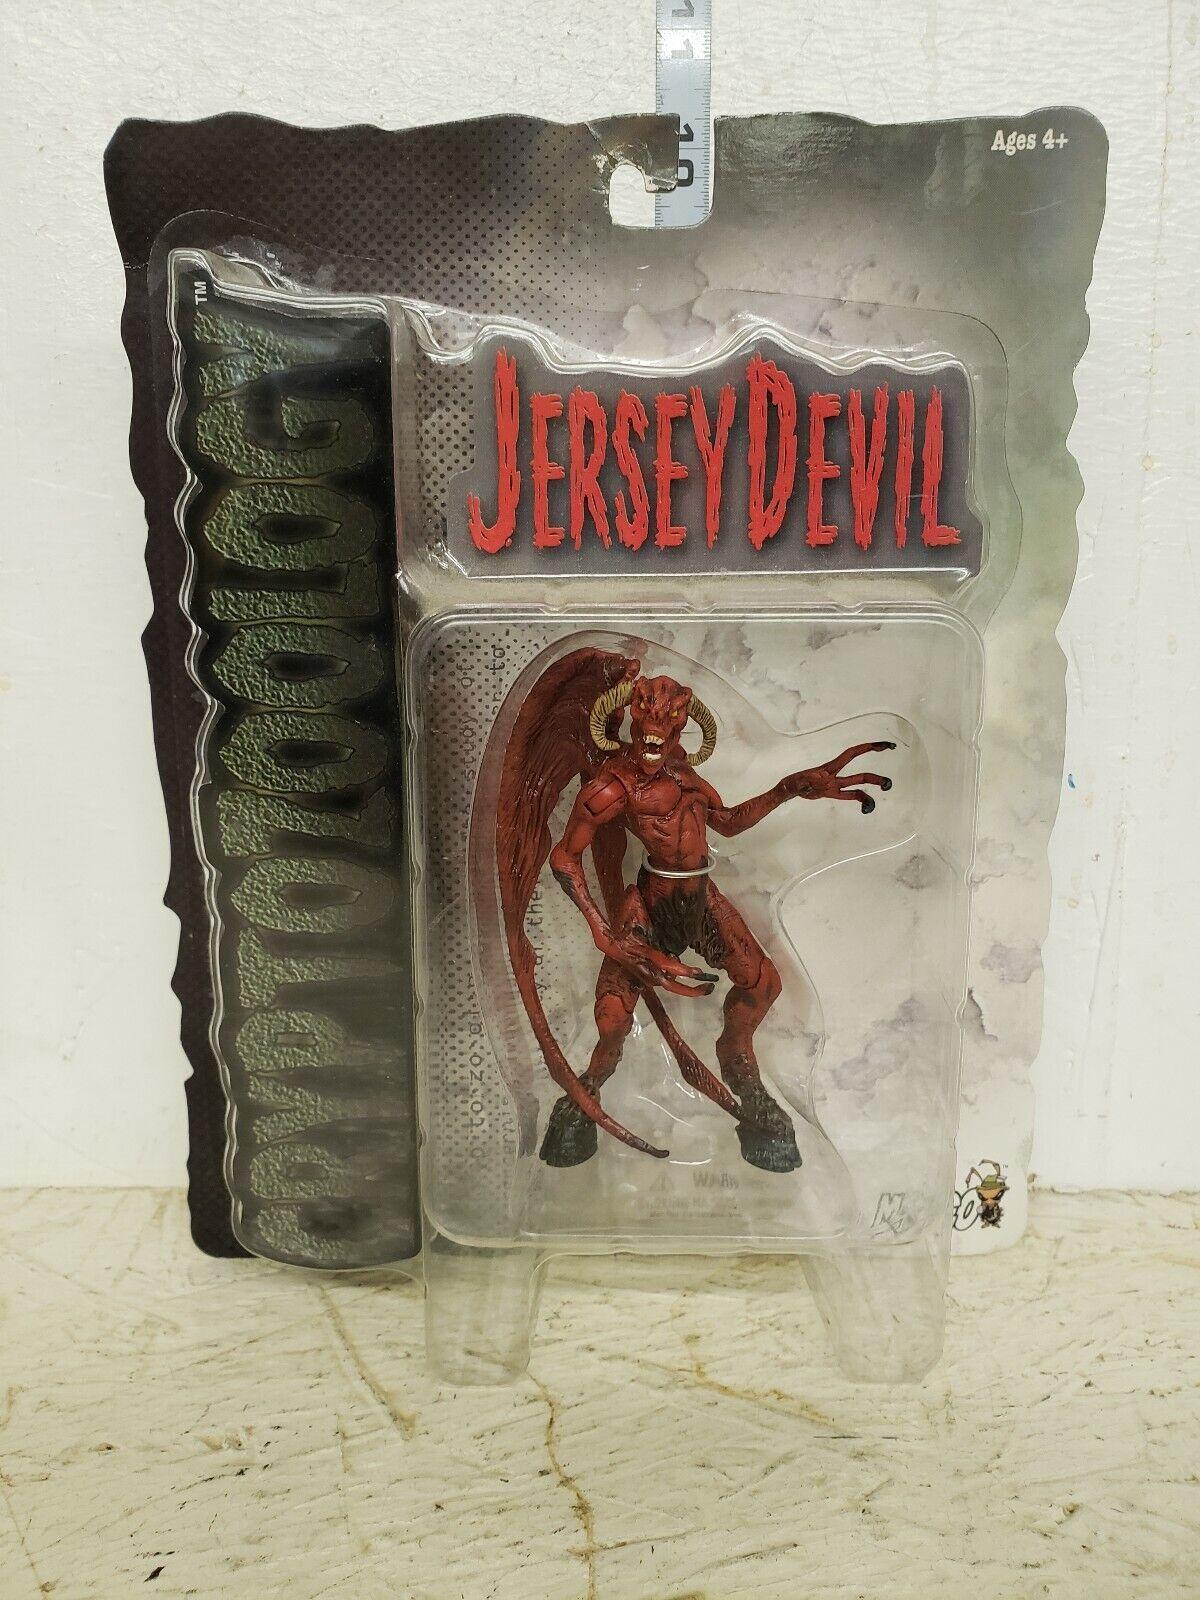 Mezco cryptozoologie Jersey devil figure